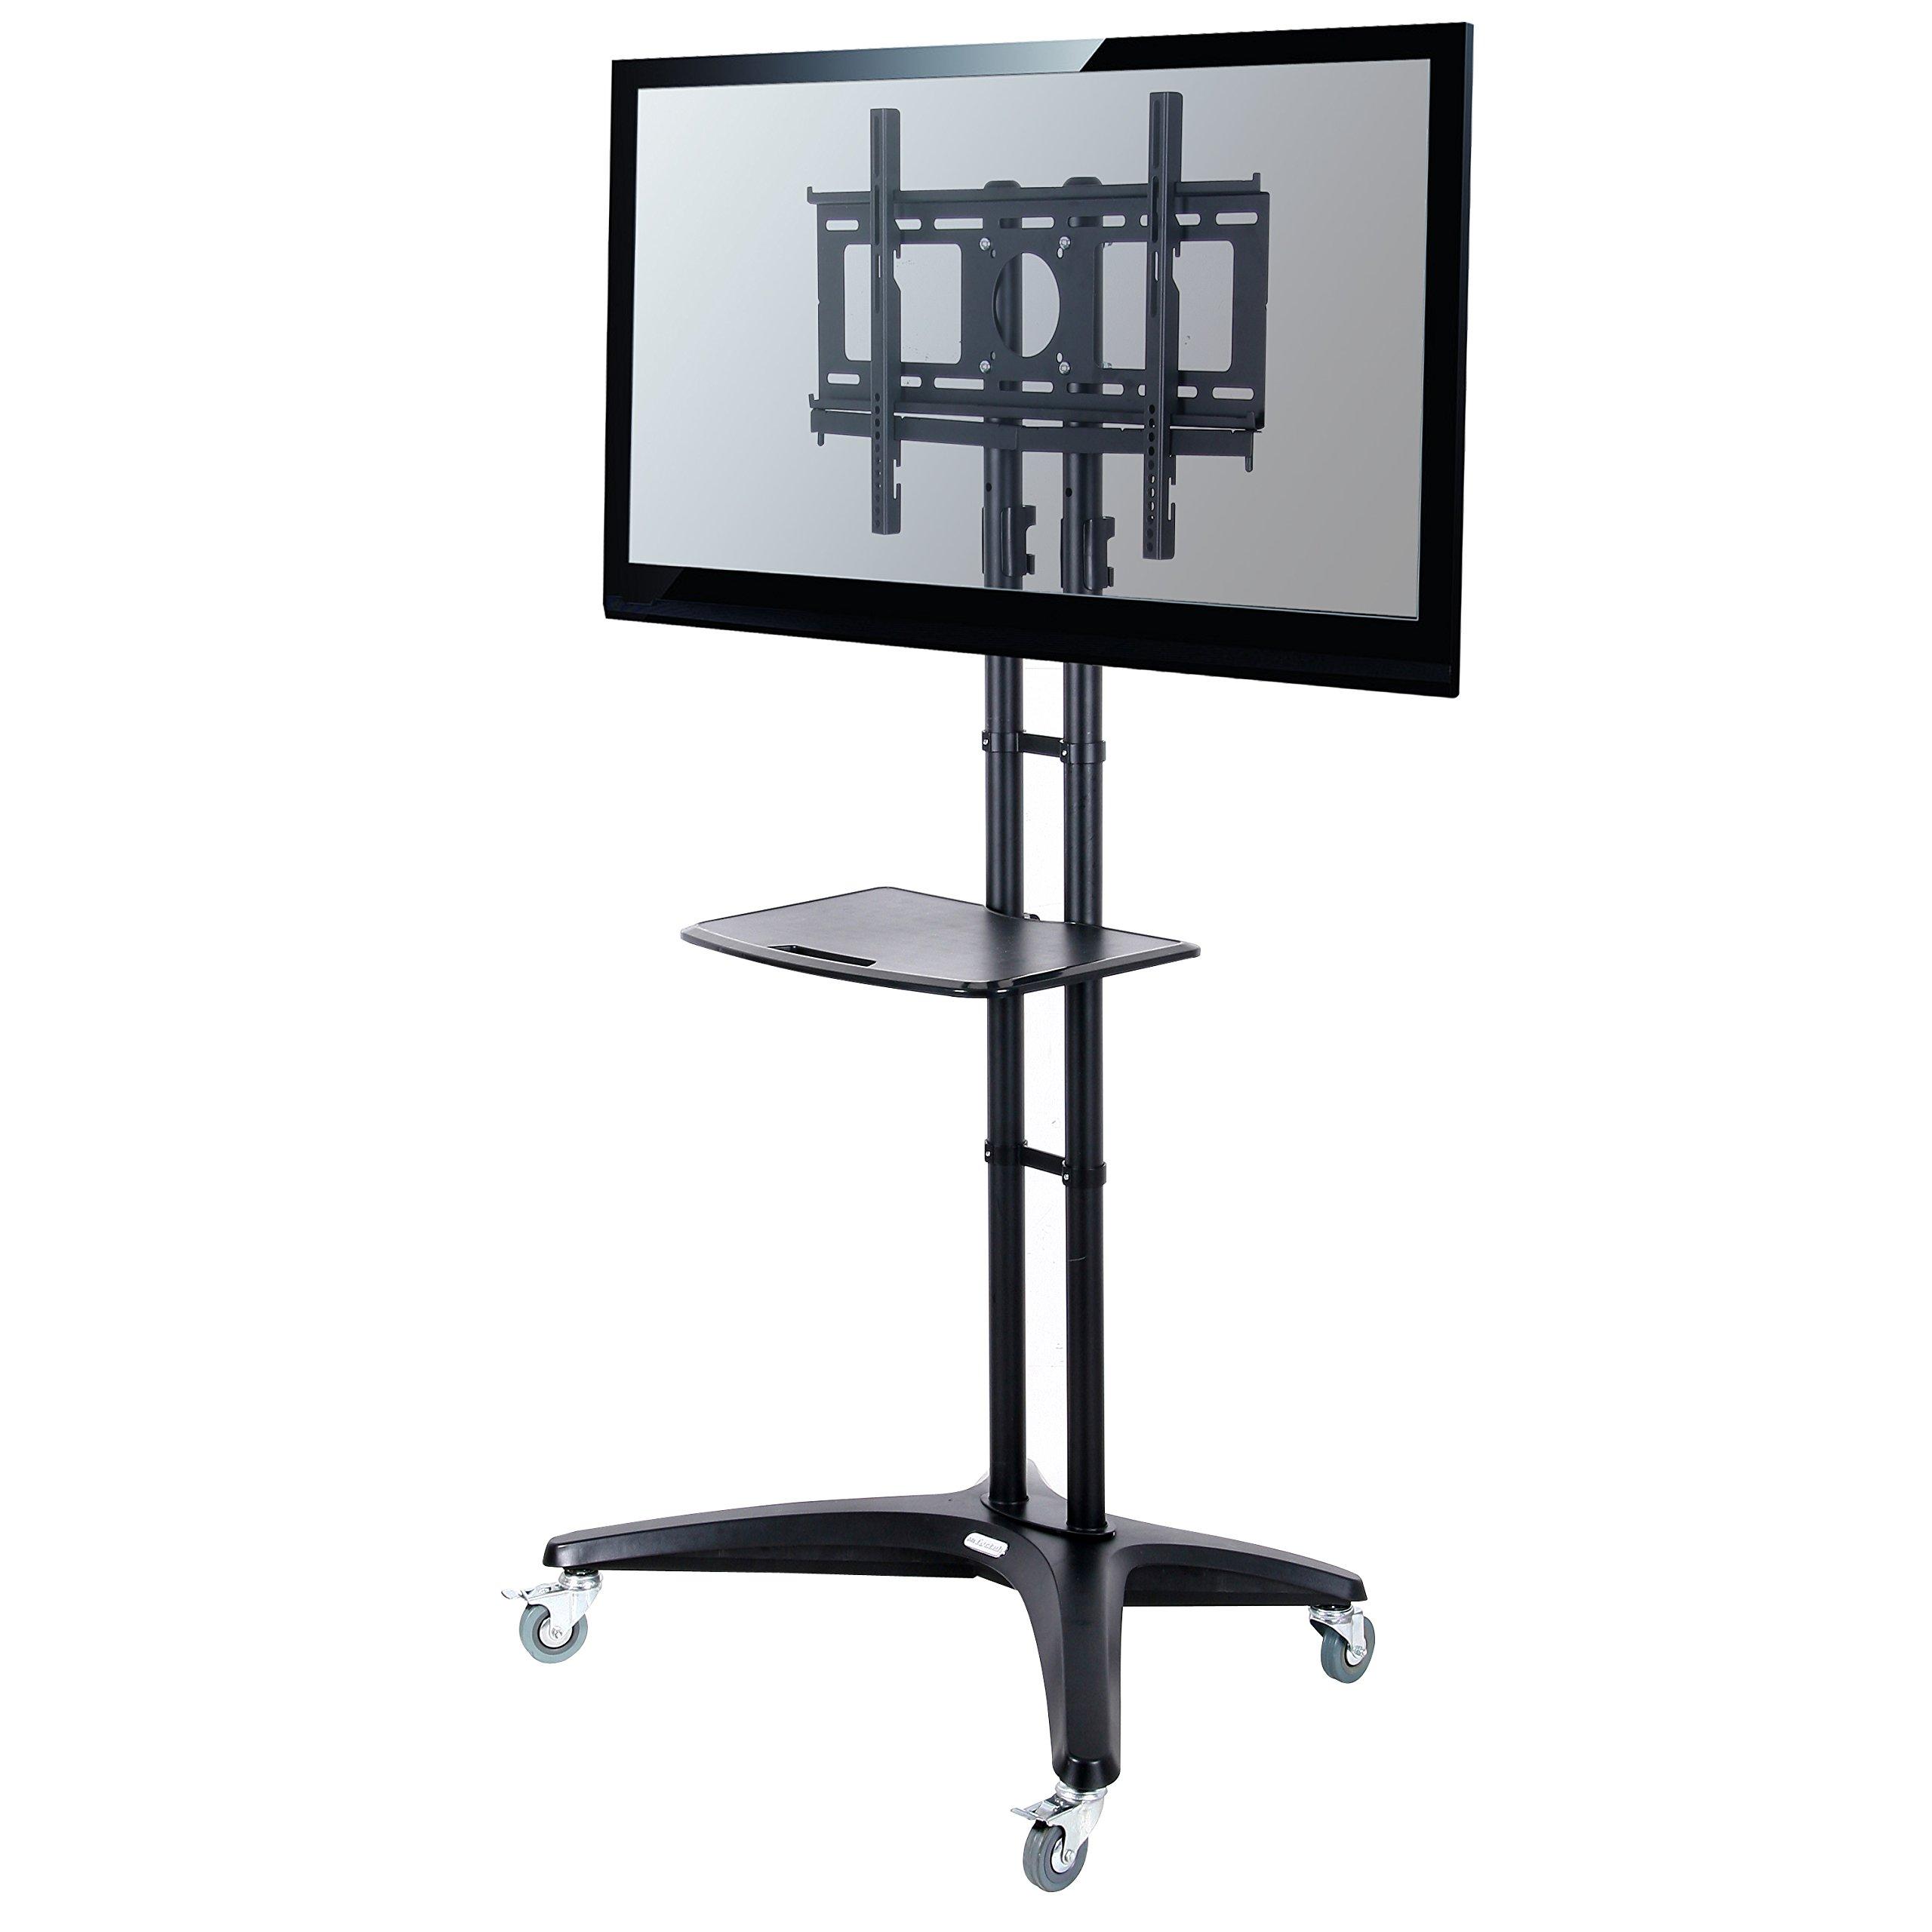 Fleximounts C03 Universal Rolling TV Cart for 32''-65'' Flat Screen Monitors w/ DVD Plastic Shelf & Wheels